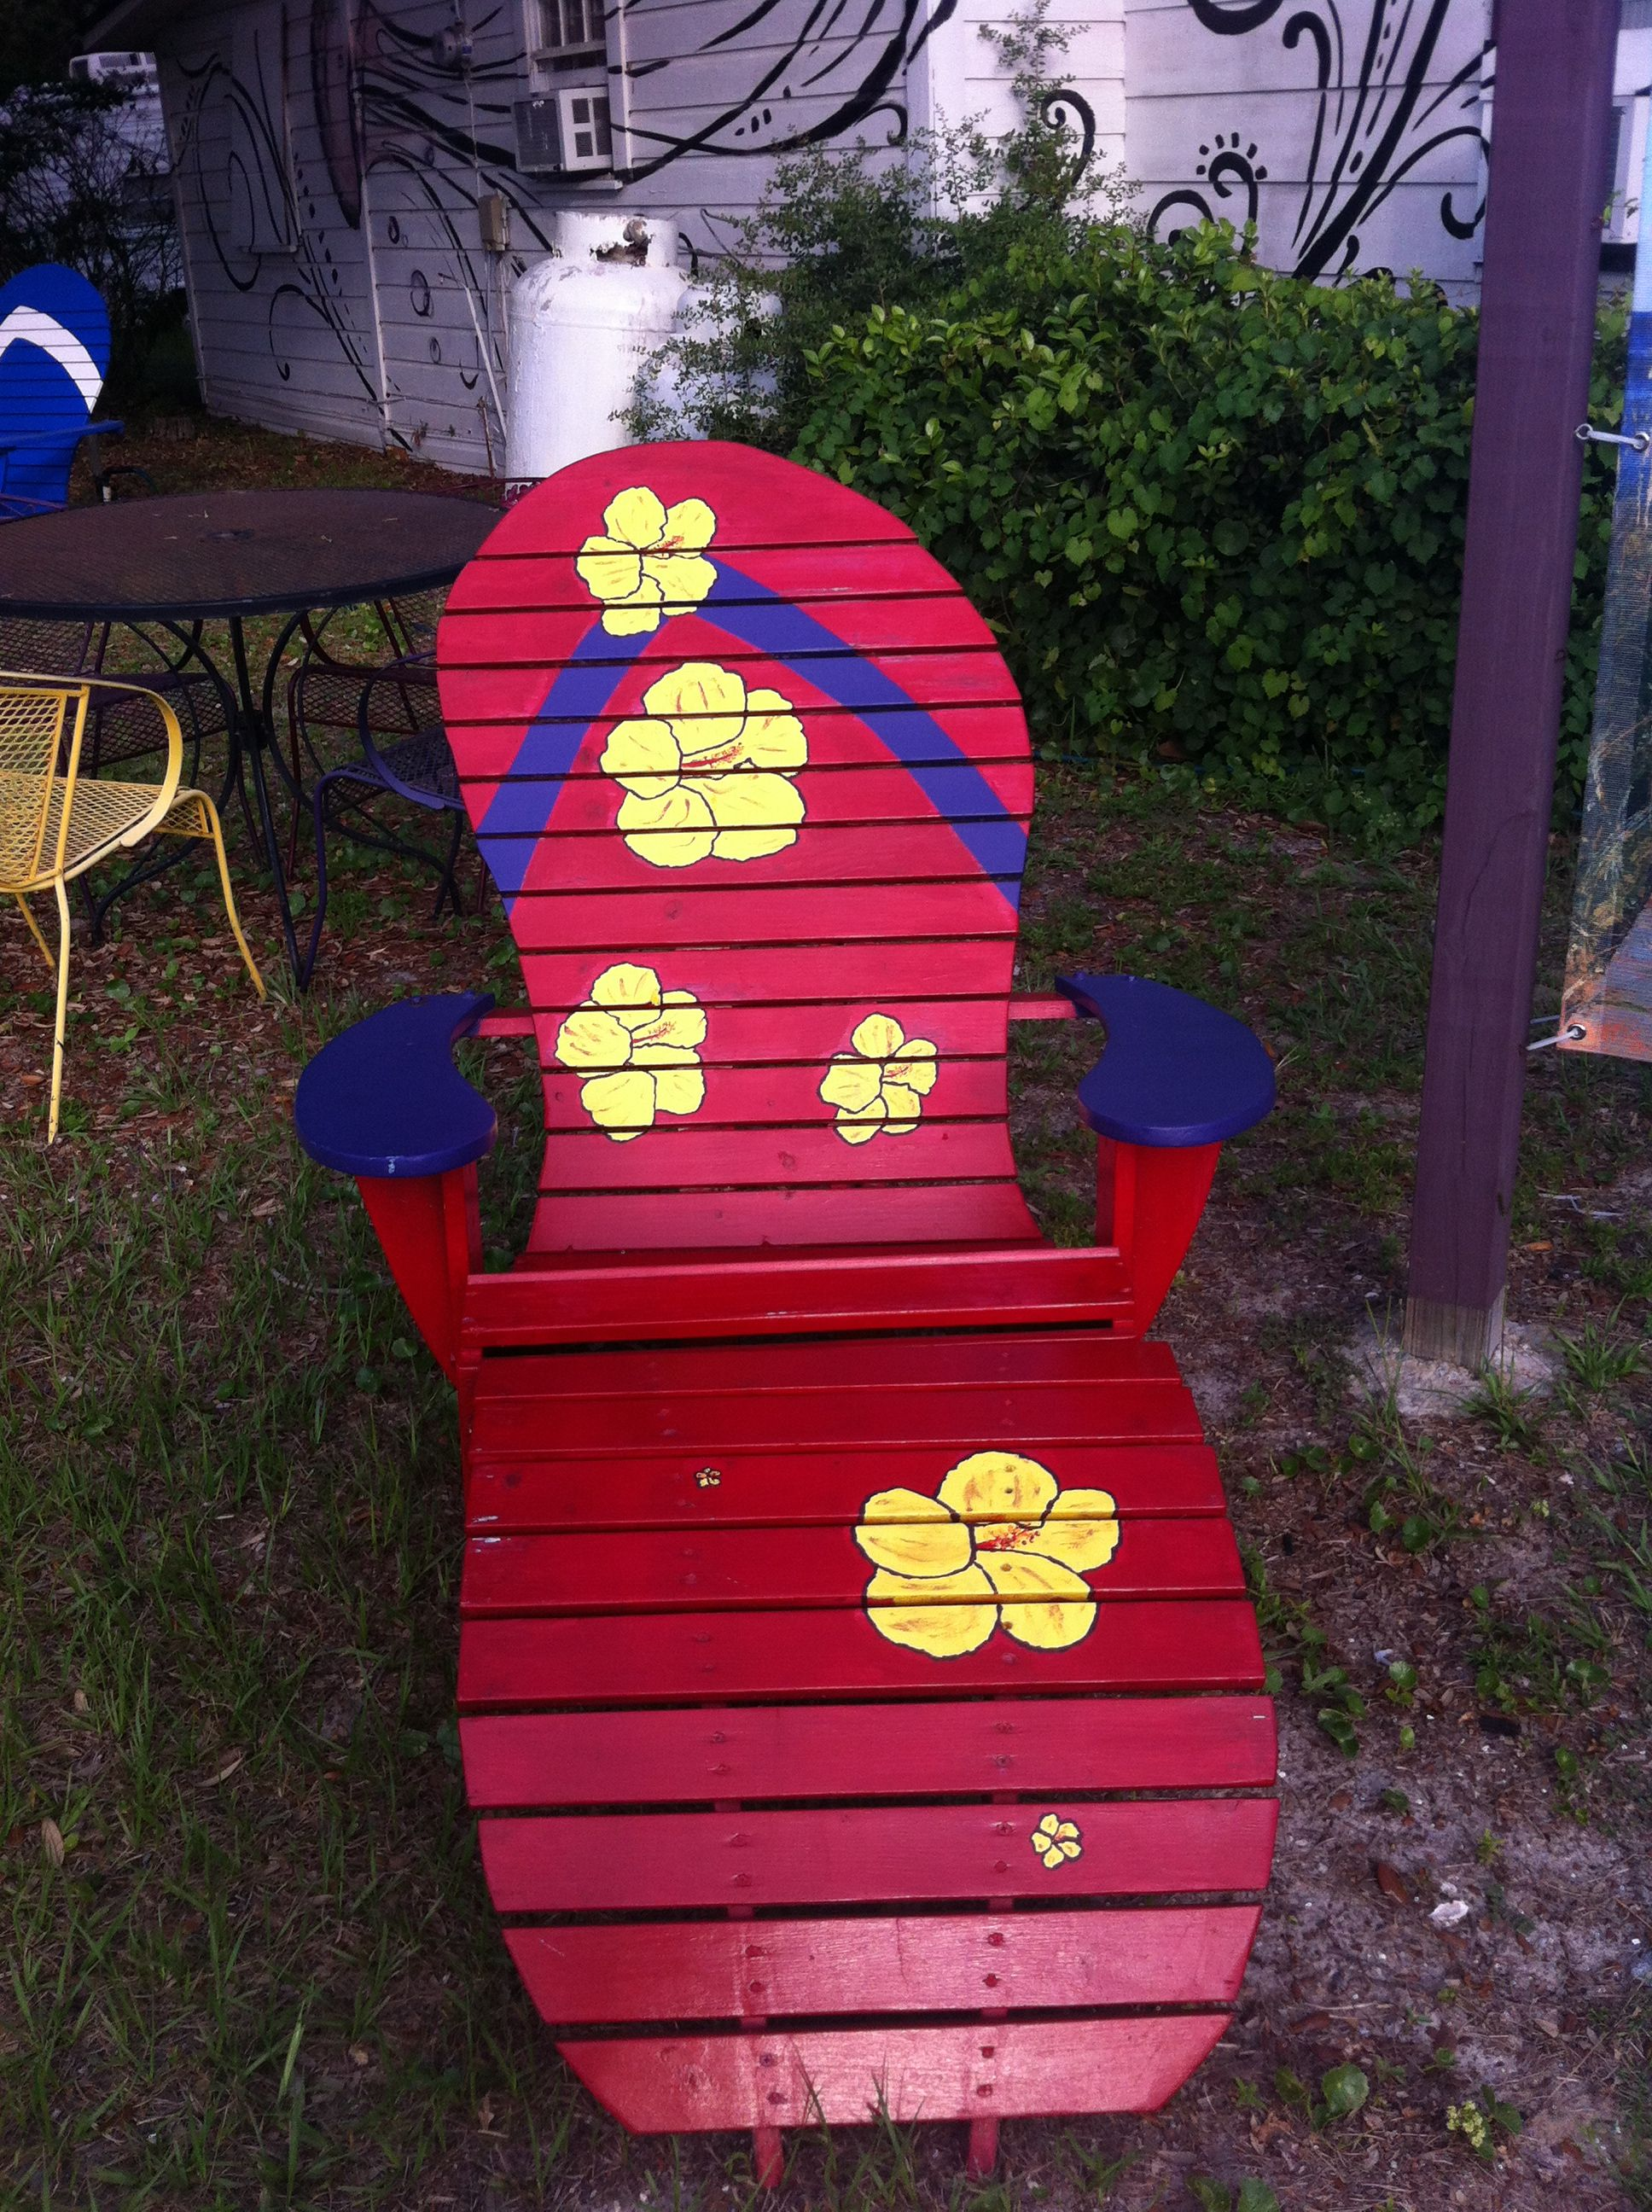 Cute Red Flip Flop Chair Yard Art Adirondack